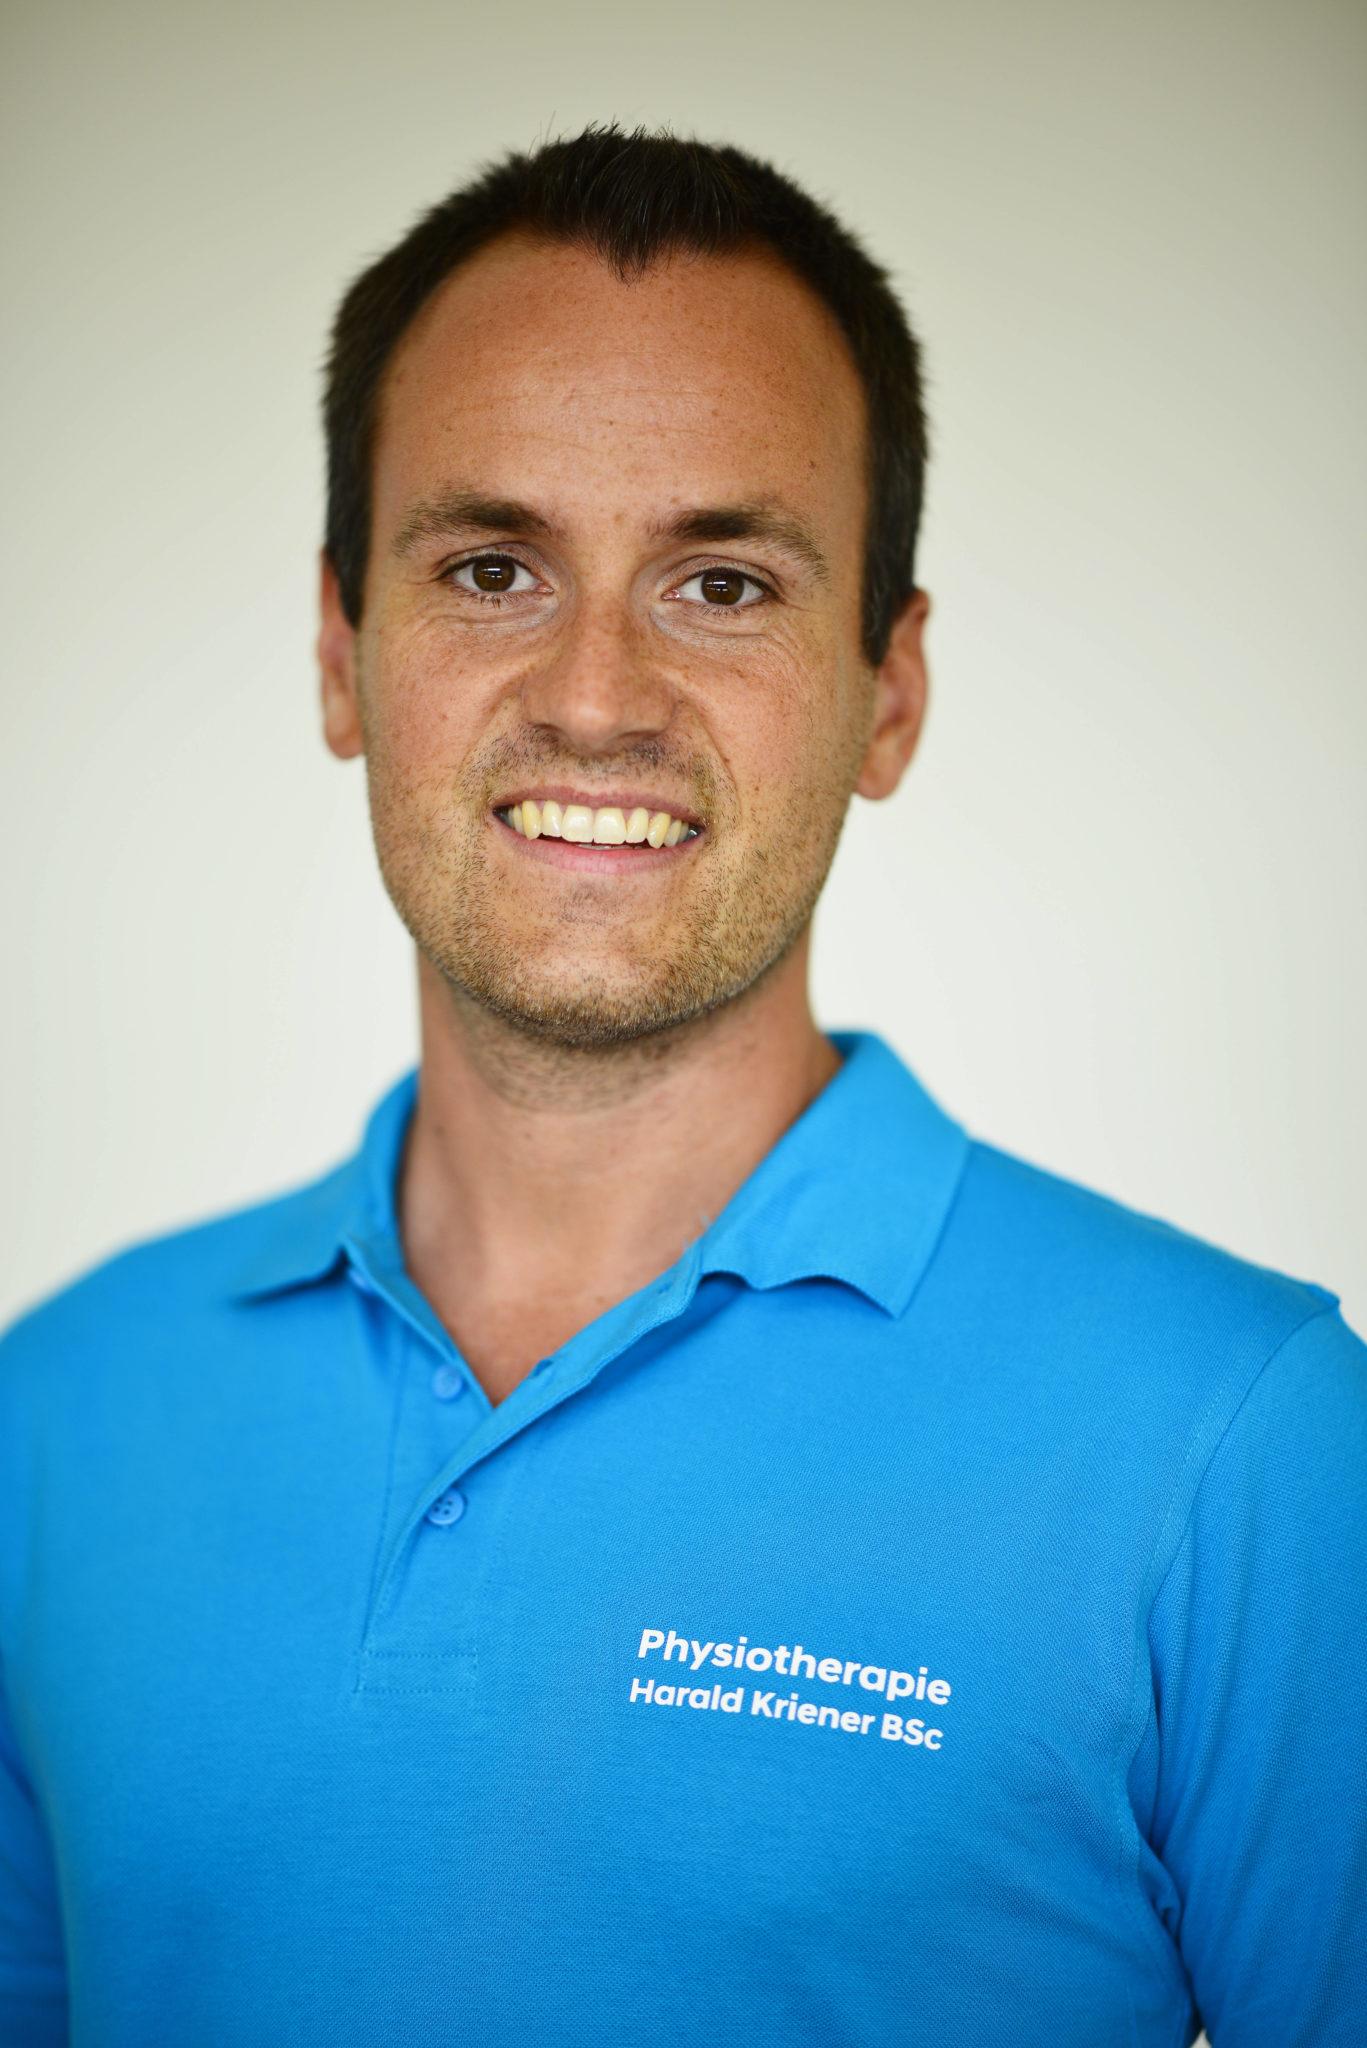 Physio-Harald-Kriener